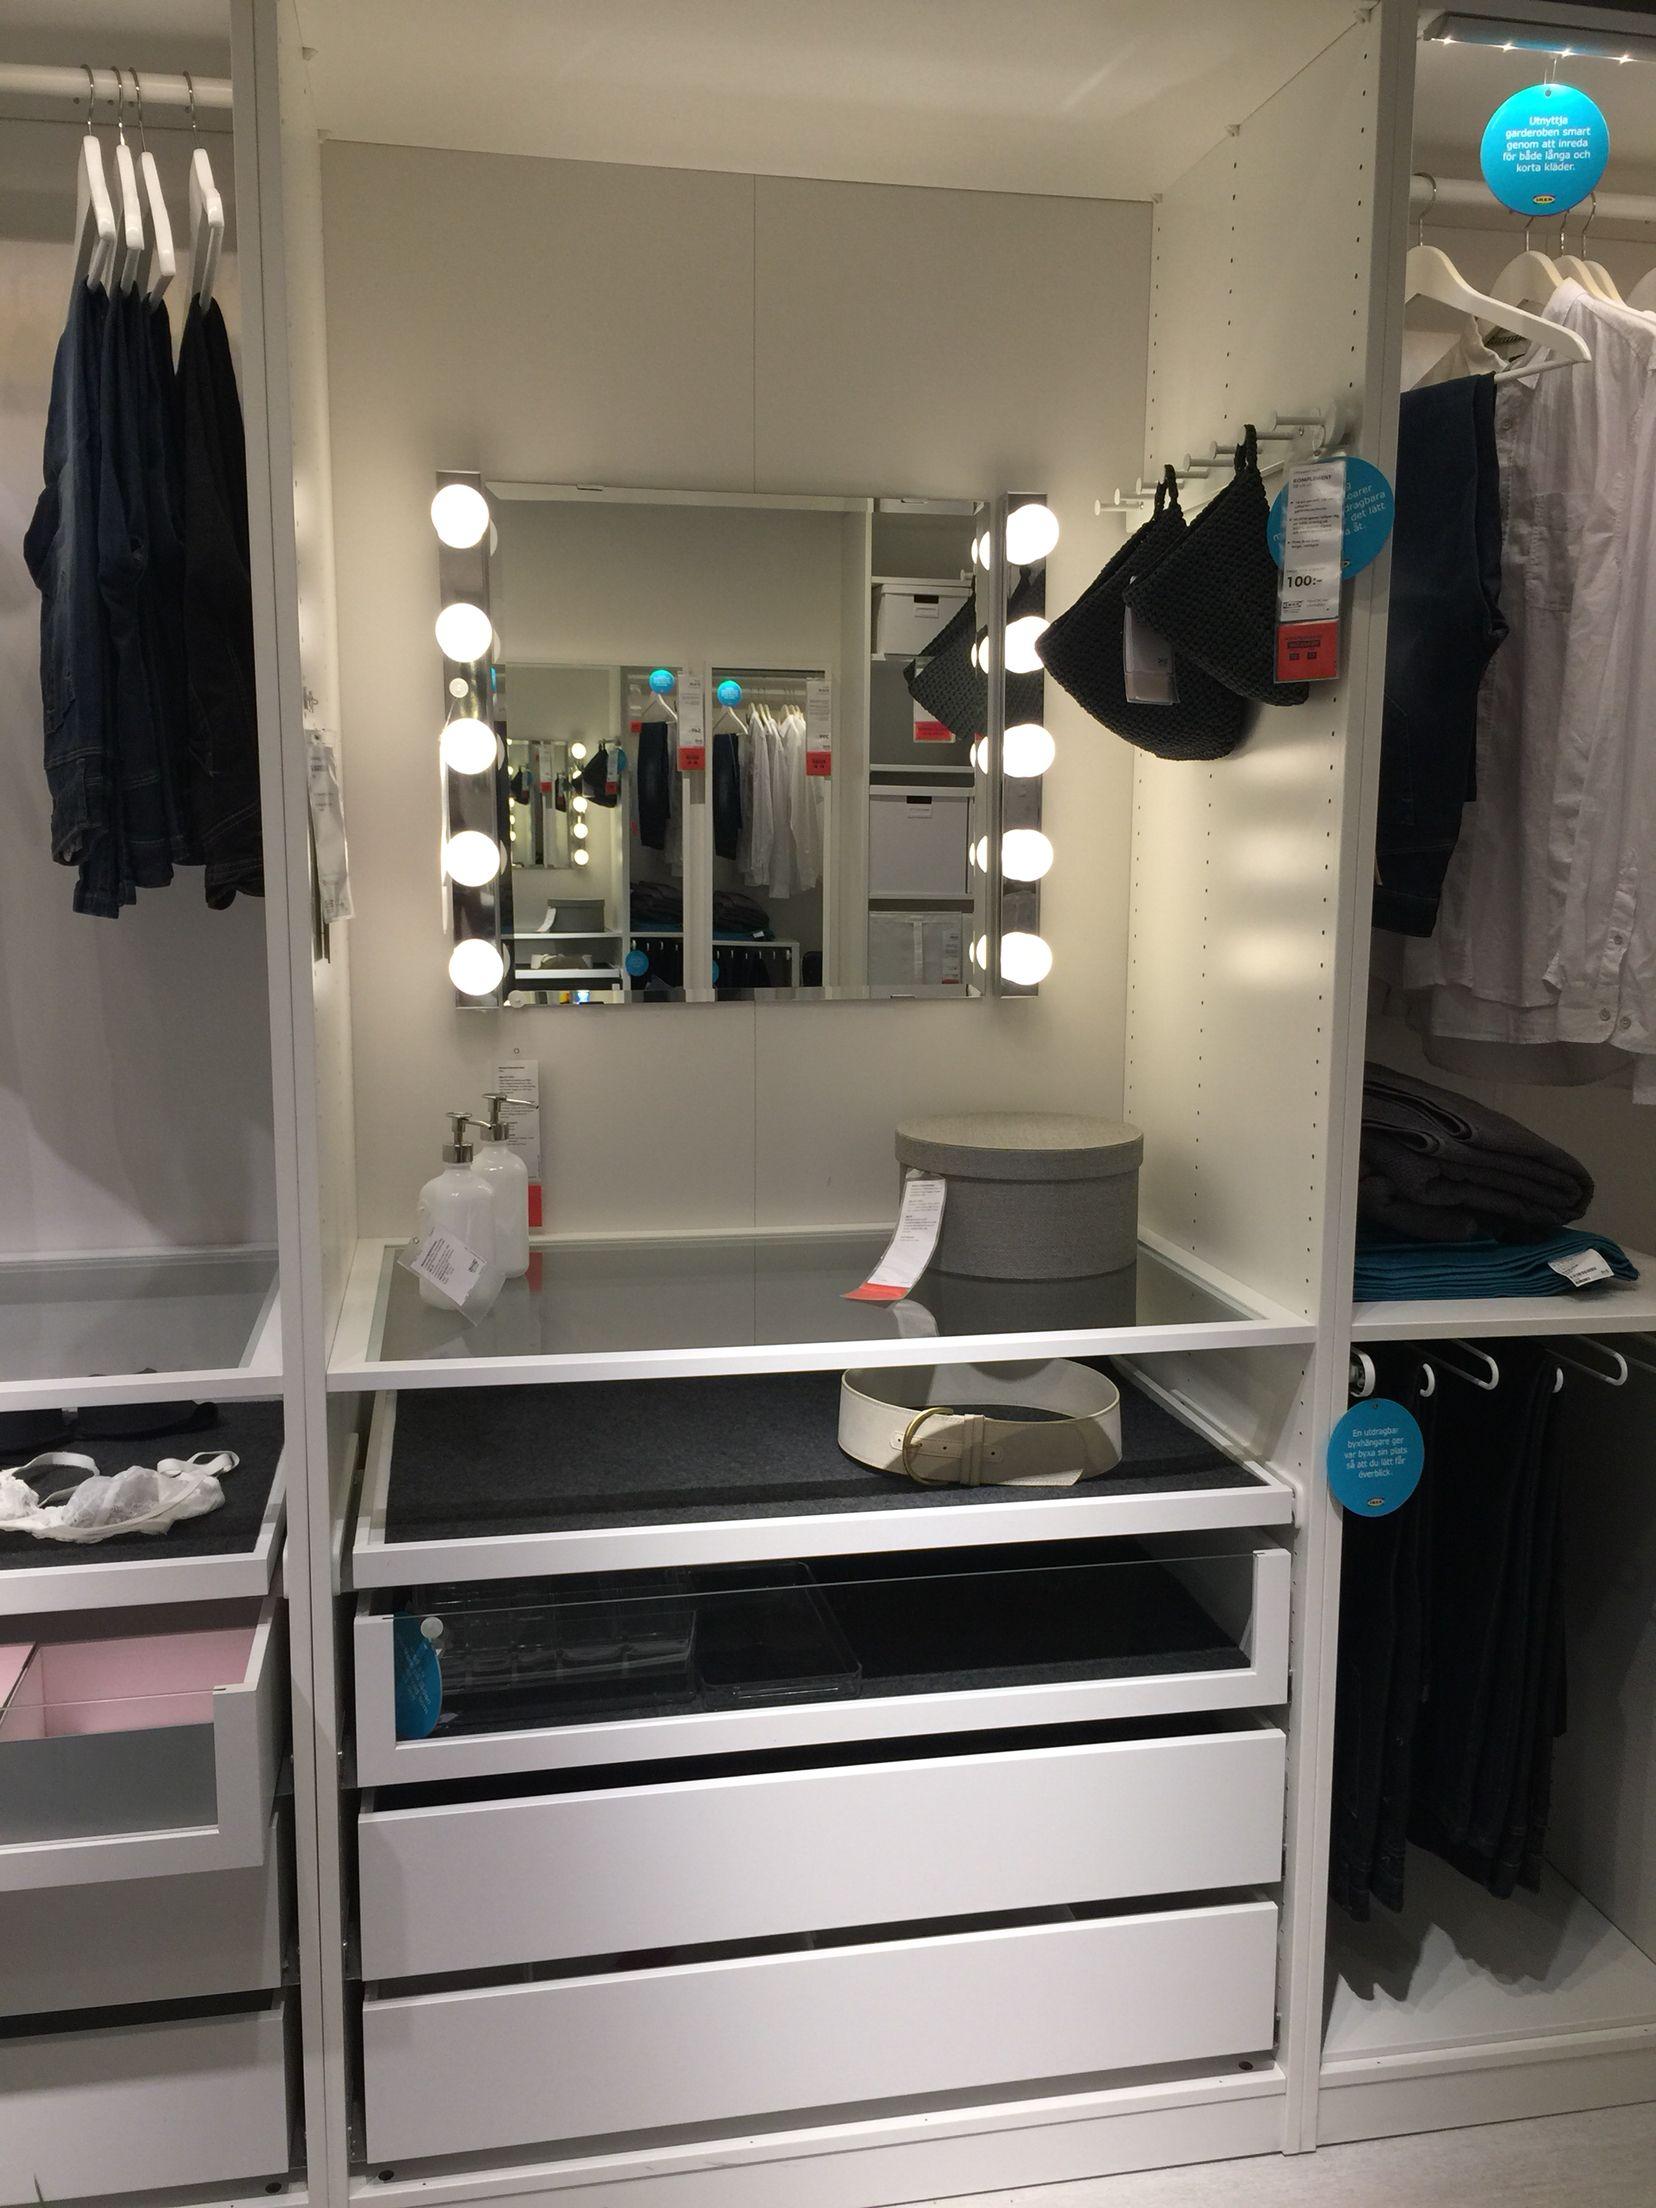 Ikea pax build in makeup station 910 walkin closet for Walk in closet india